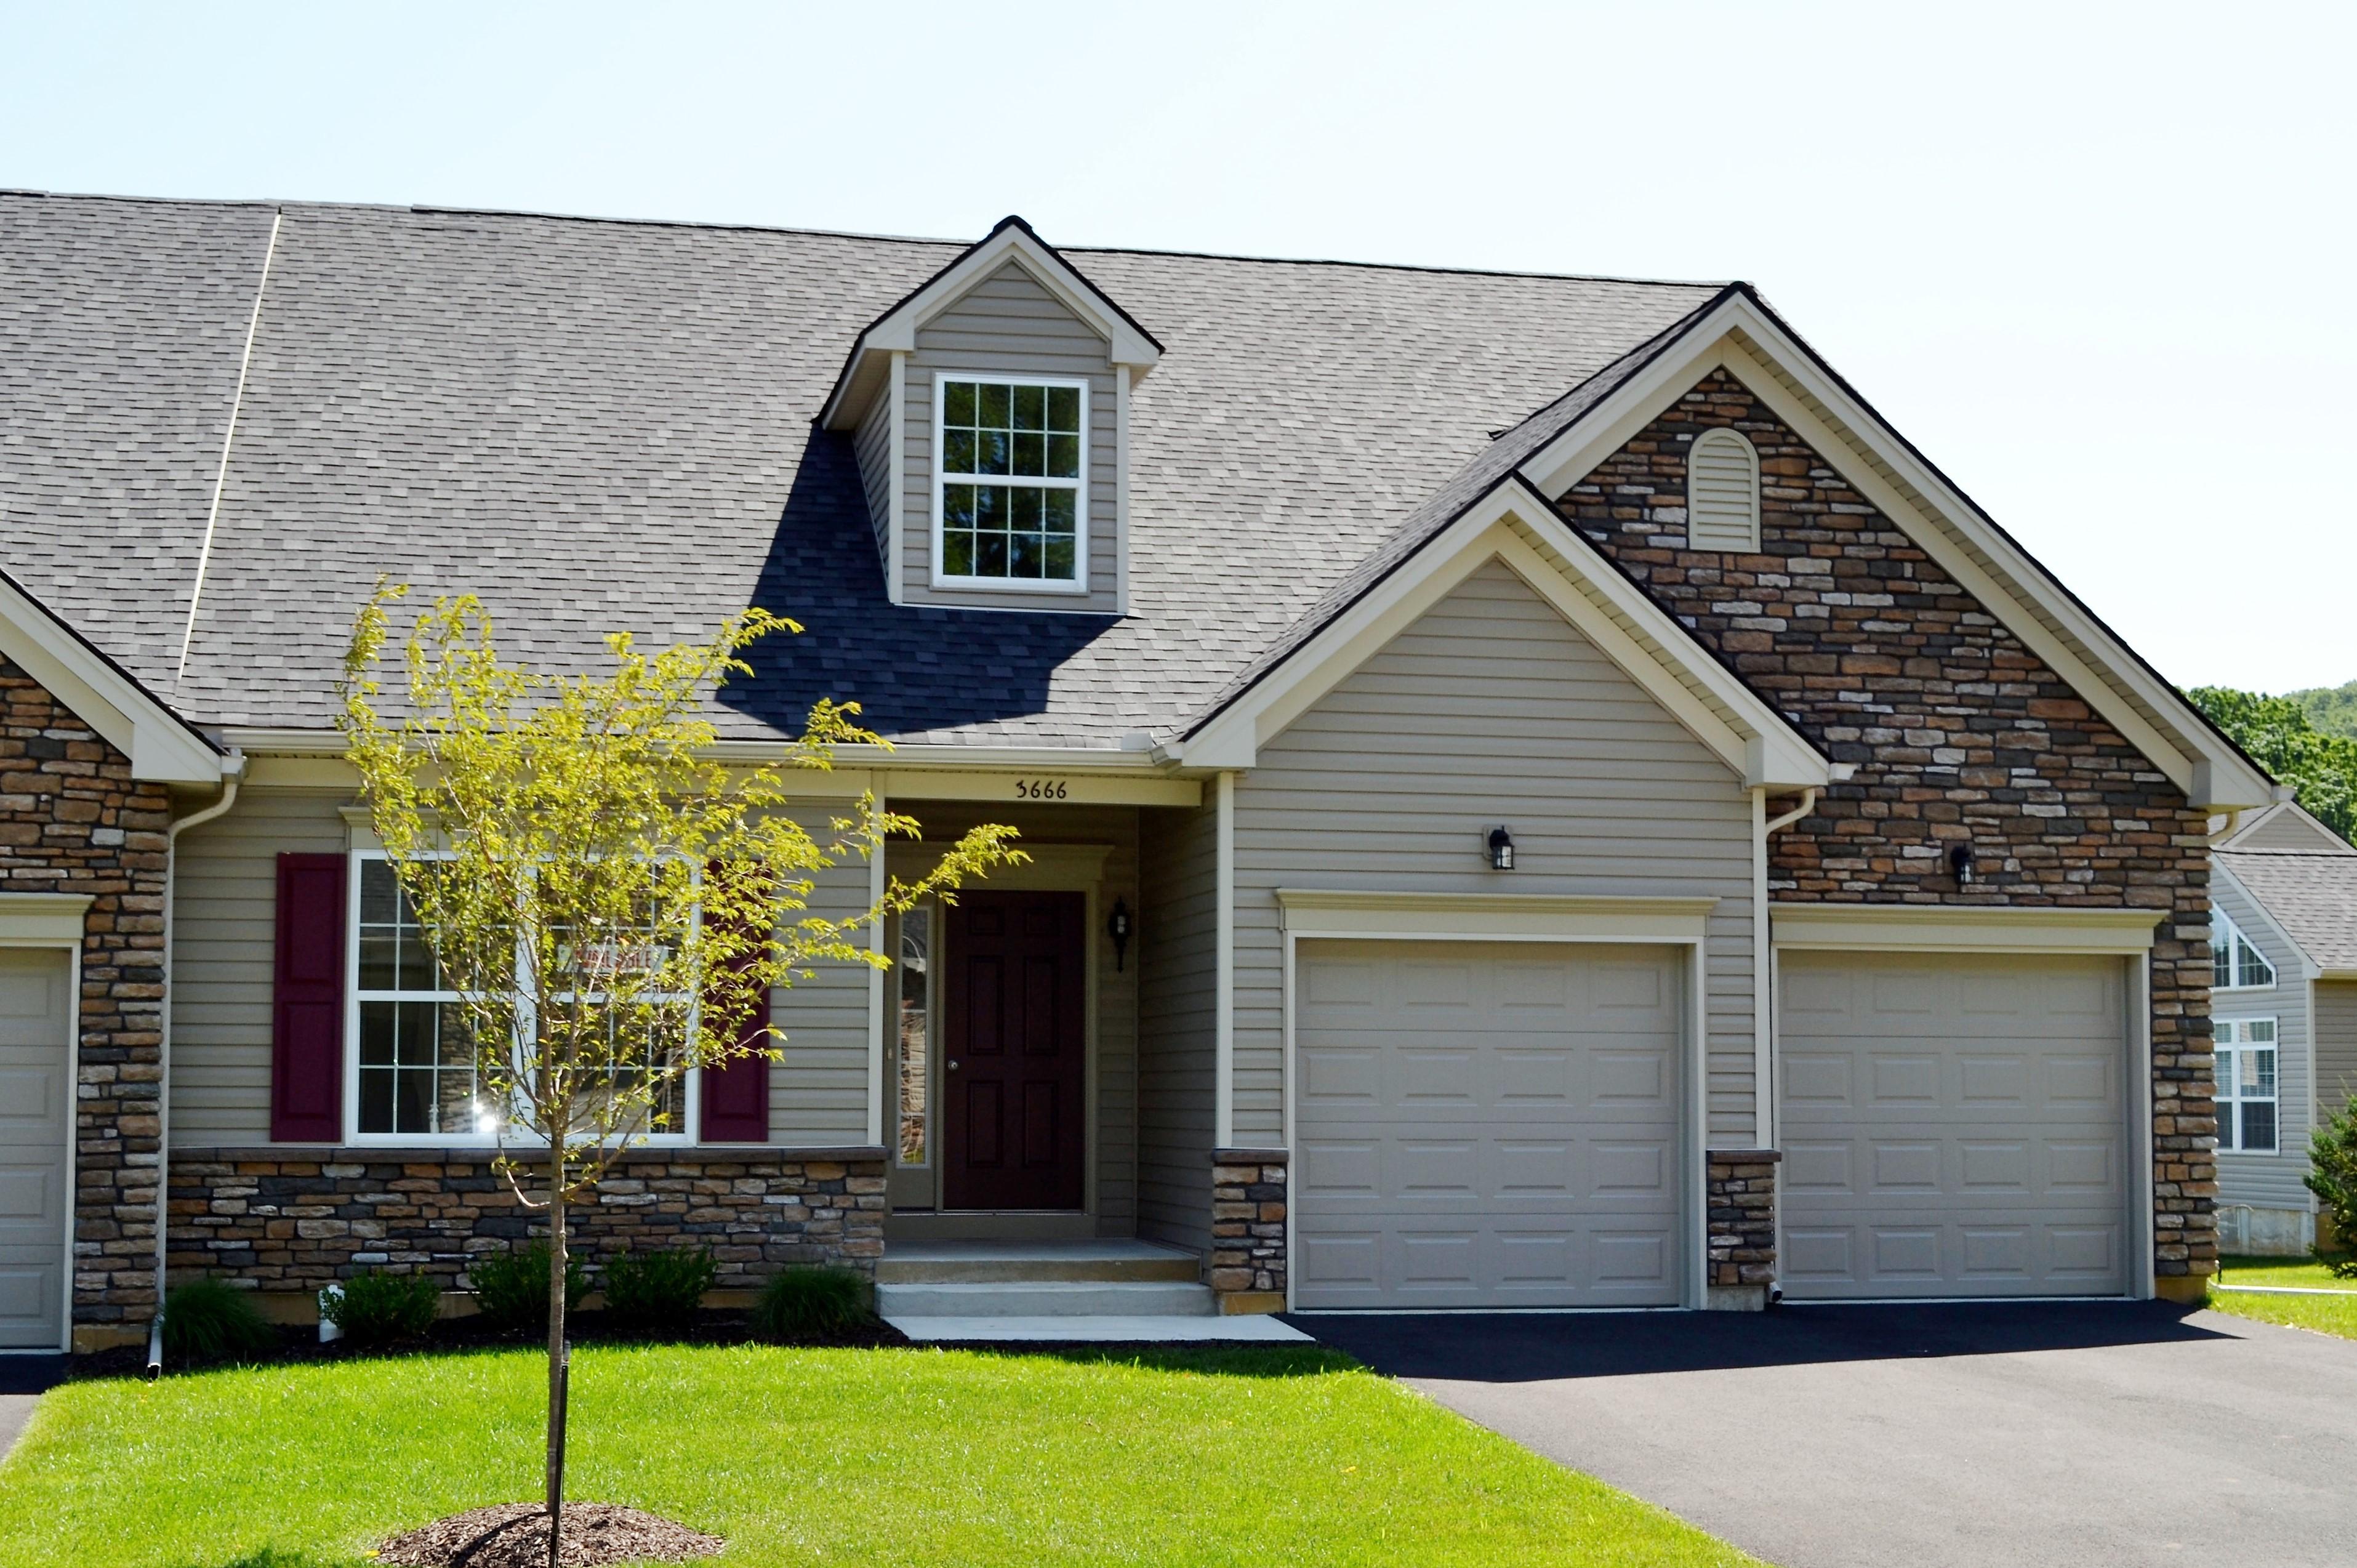 3666 Cottage Drive  Bethlehem, PA  18020